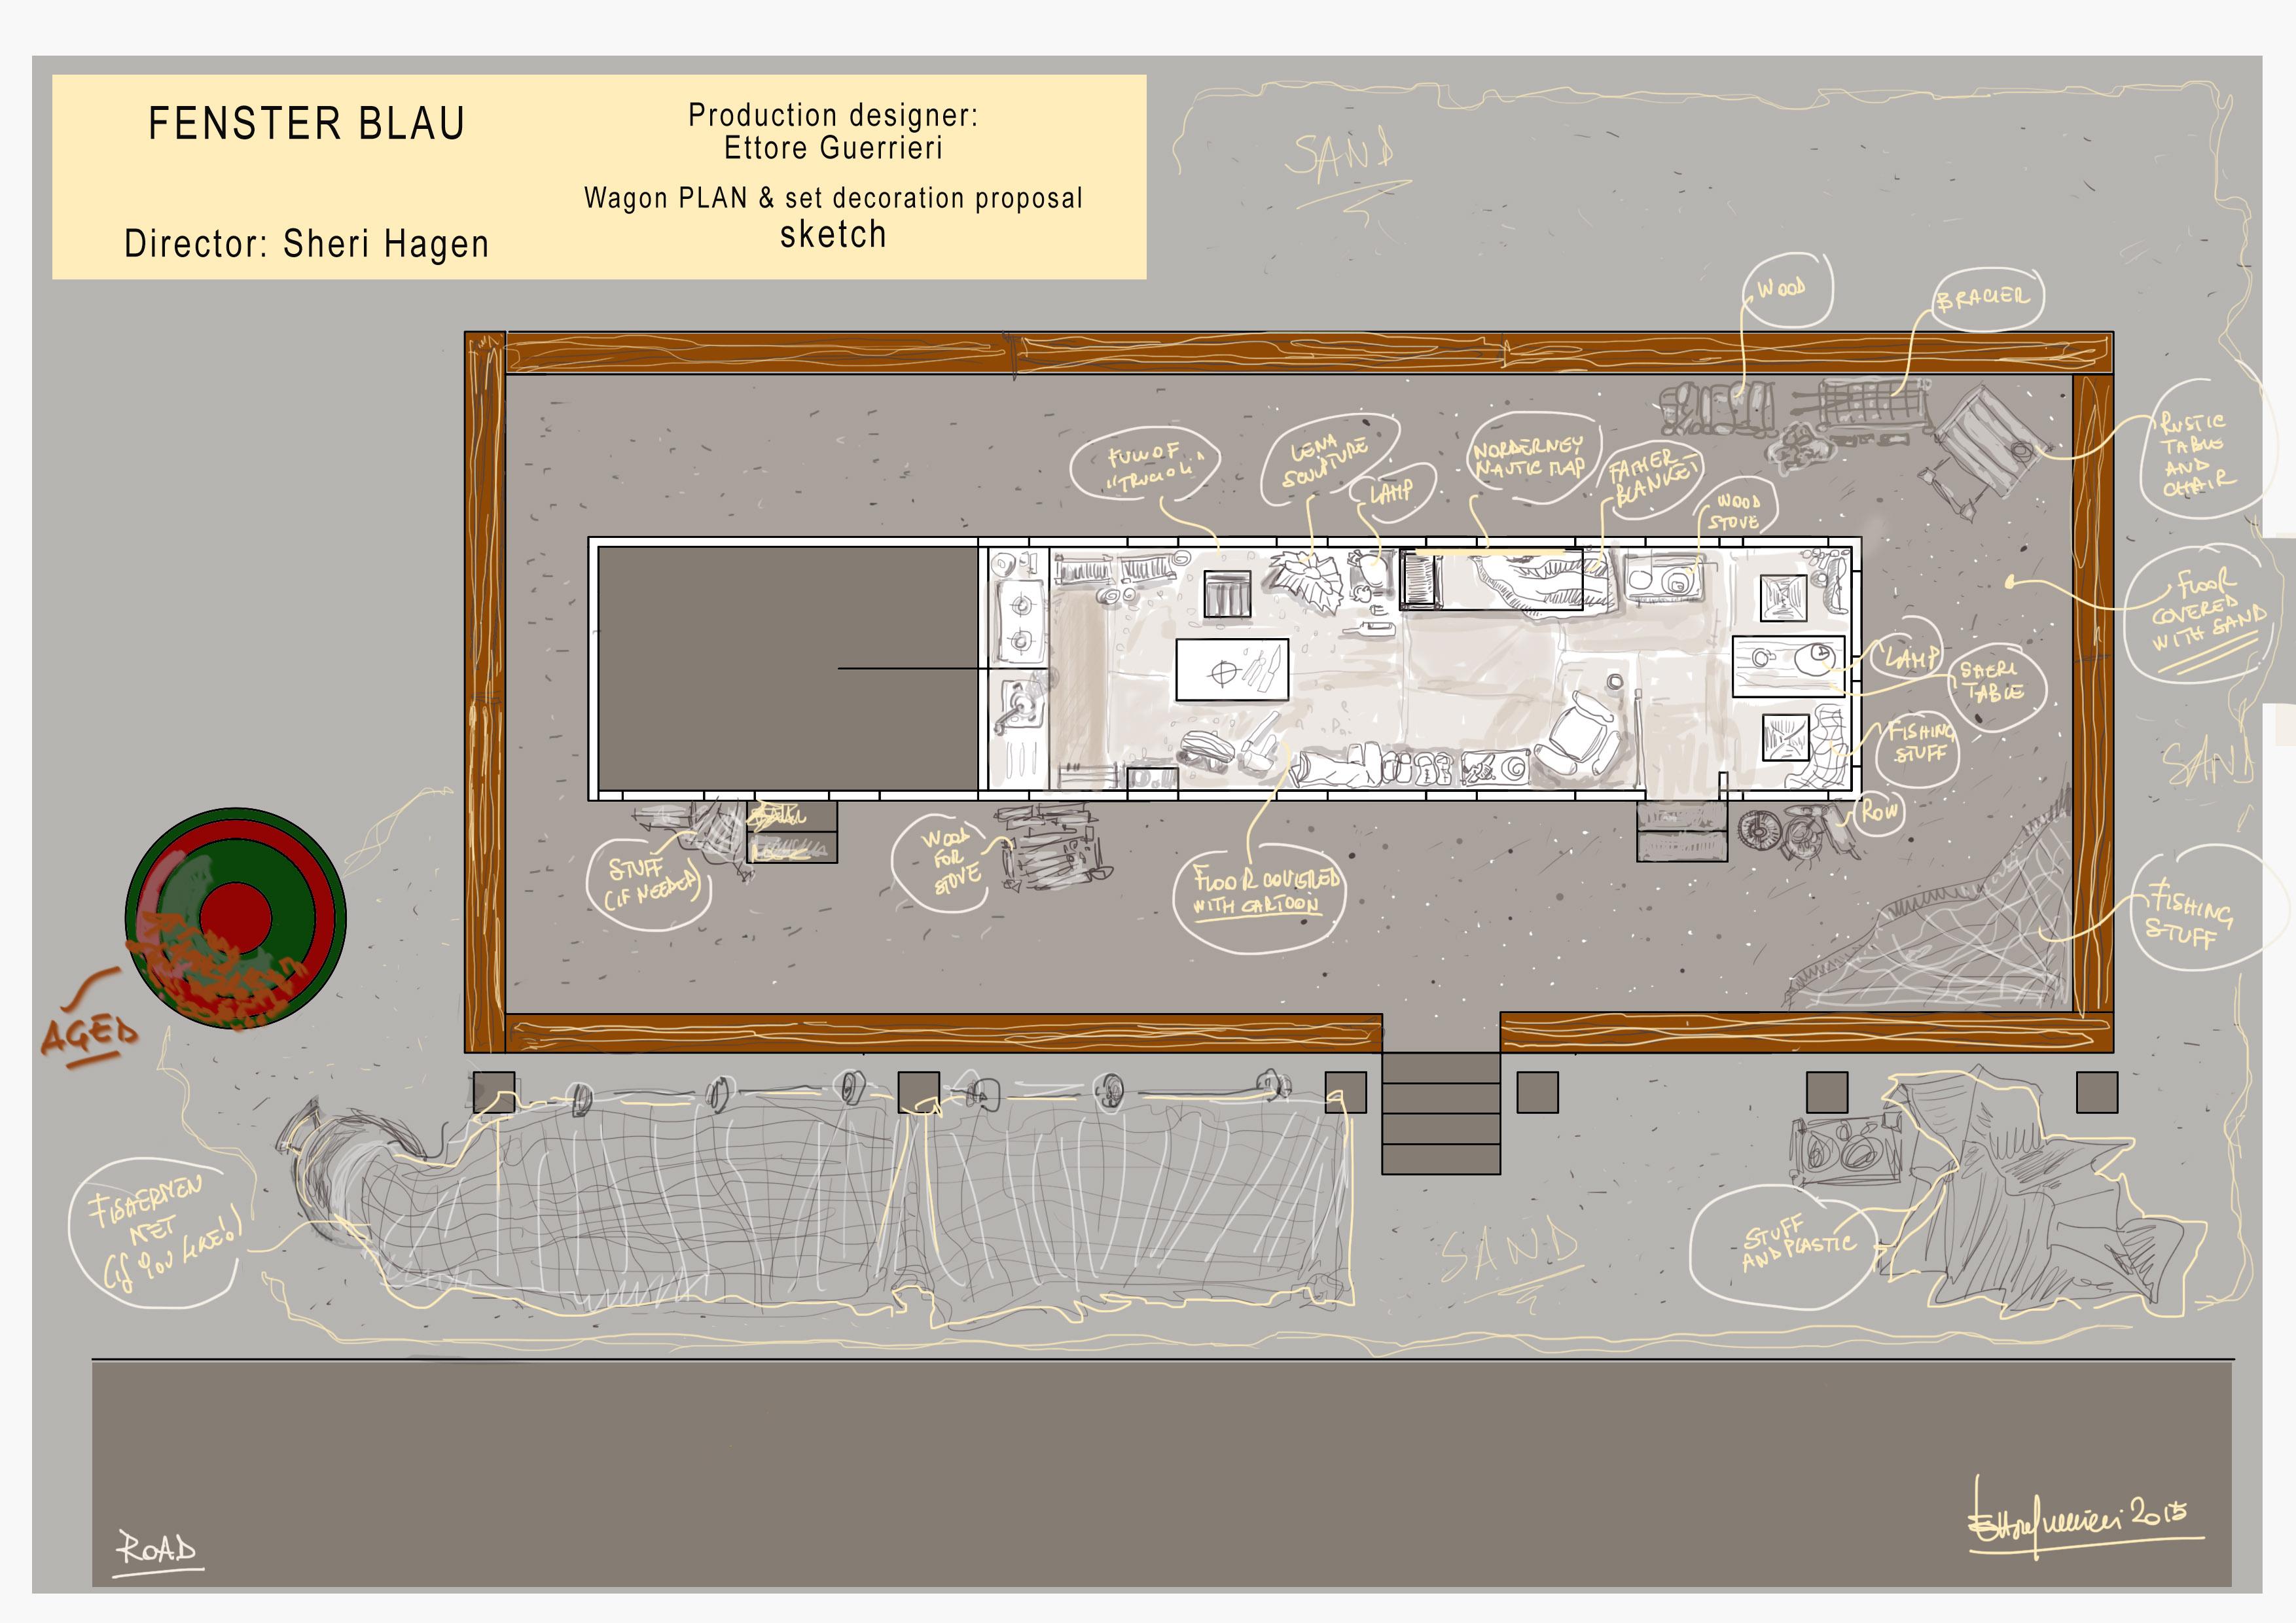 wagon plan decor